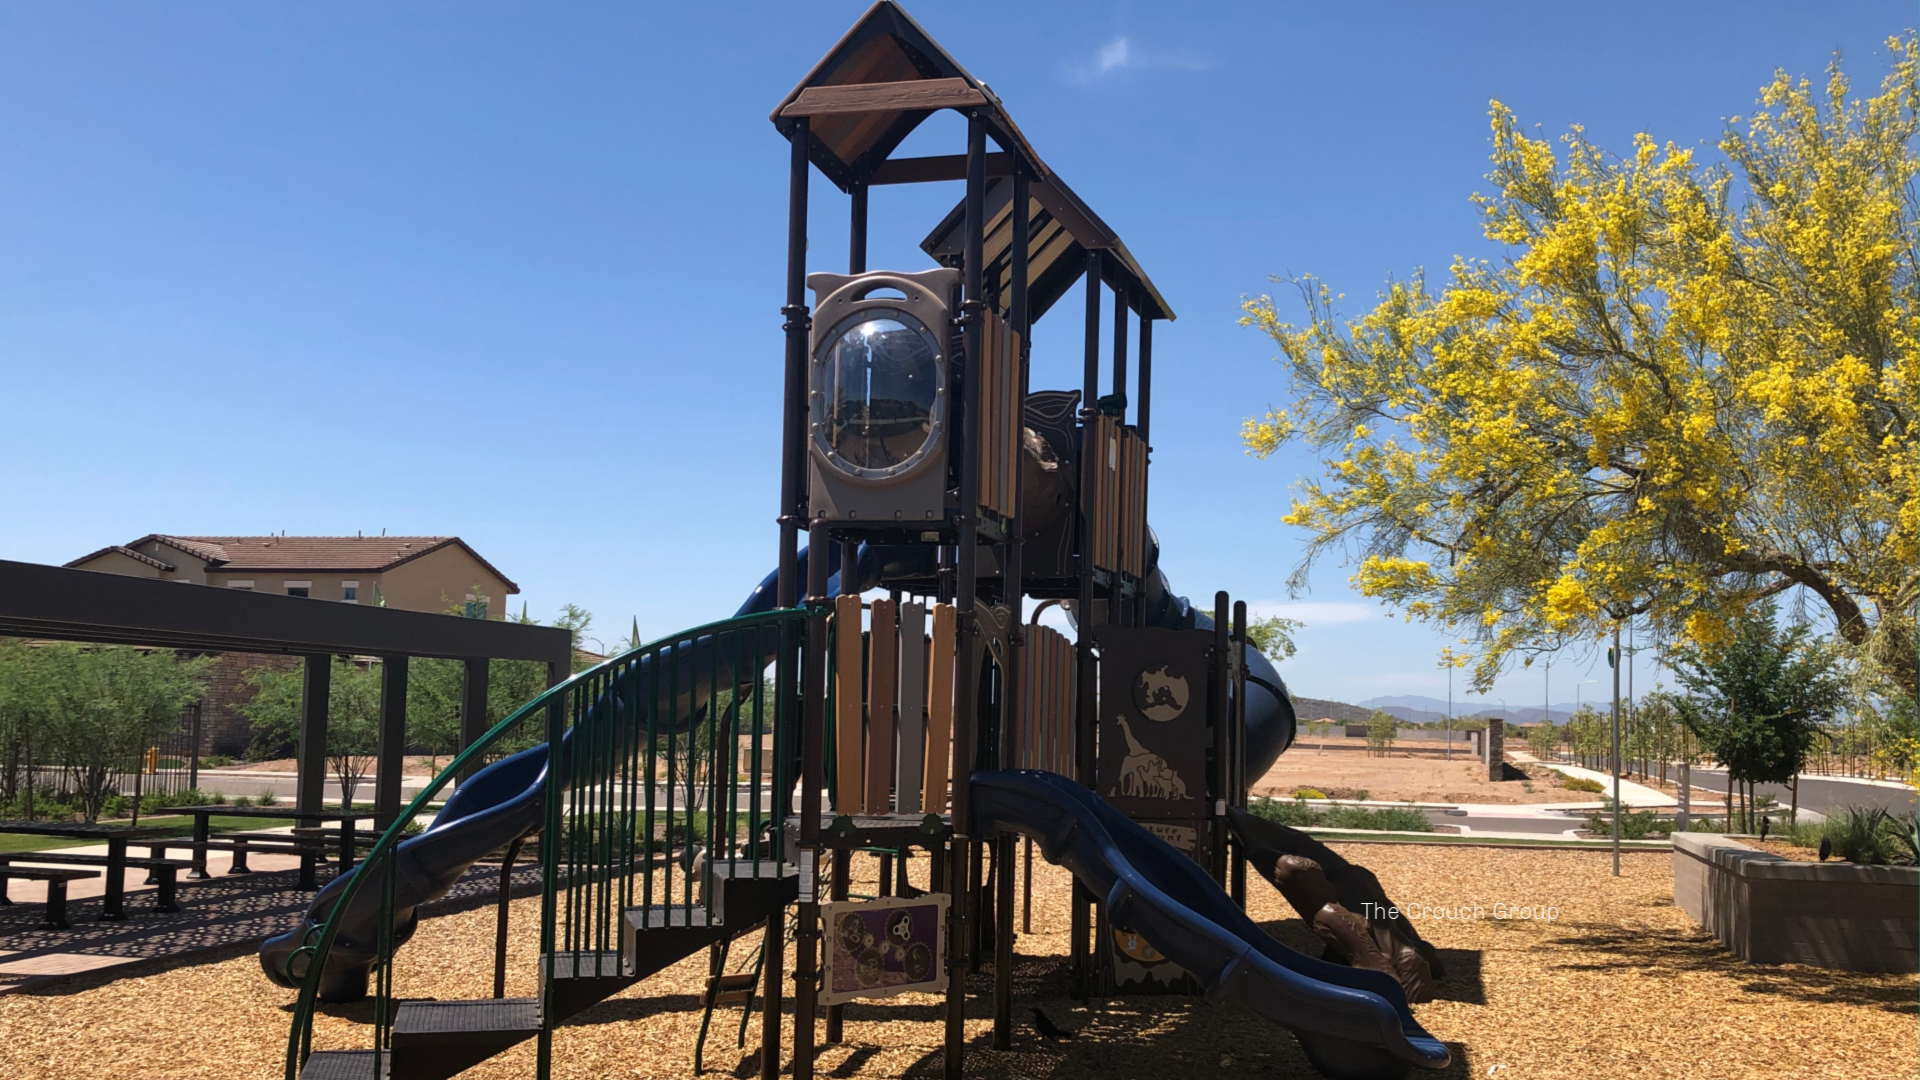 Playground 1 Union Park Norterra homes for sale